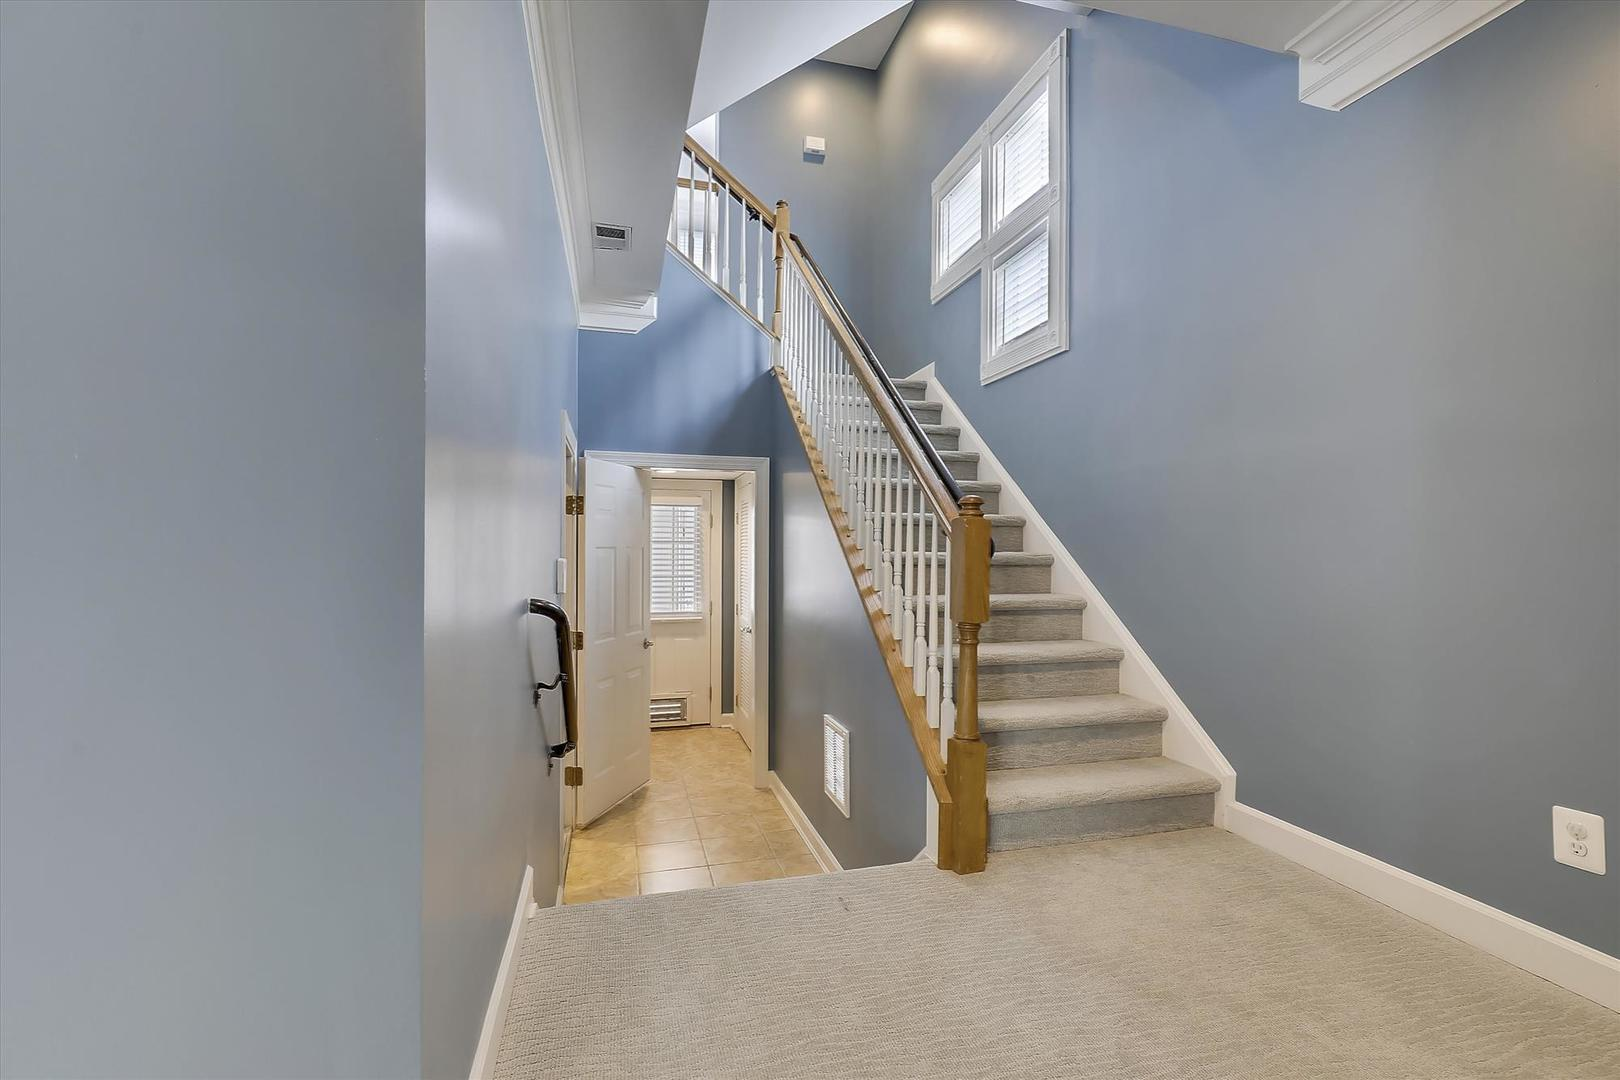 28 Seaside Dr. - Steps to Second Floor